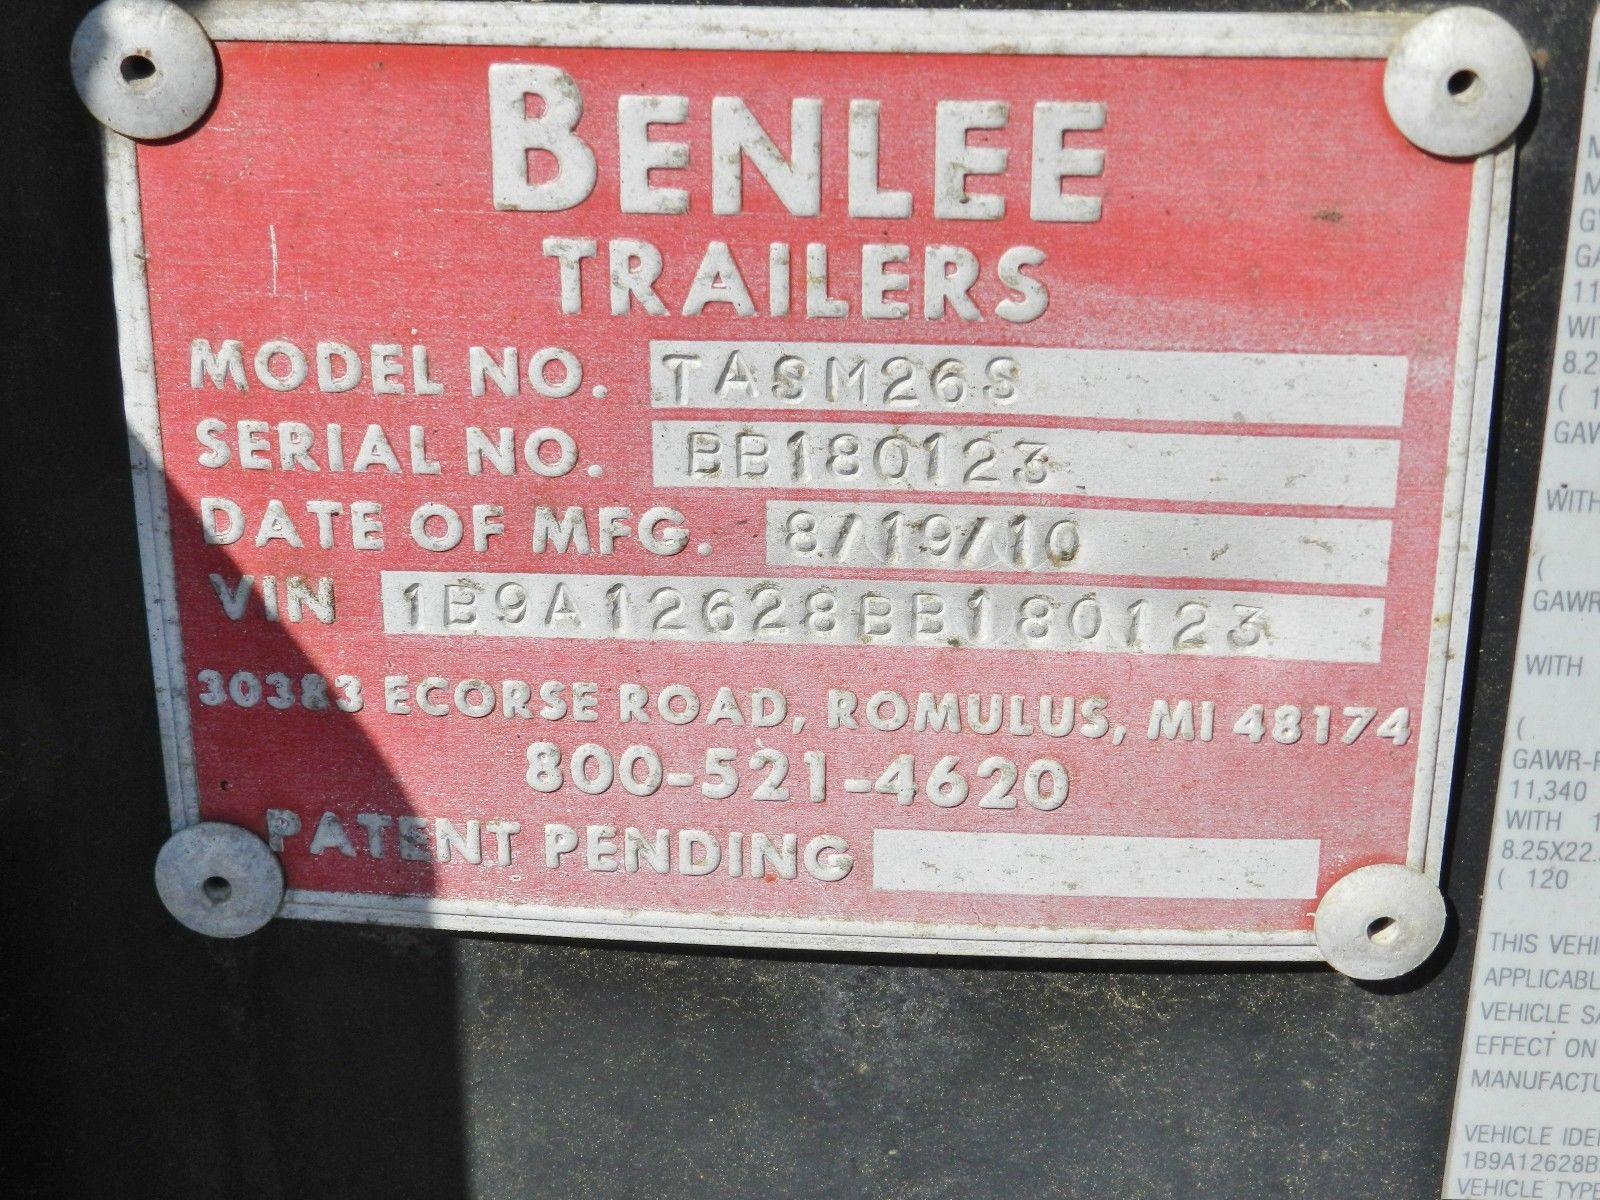 Lot 35 - 2010 Benlee Roll-Off Trailer